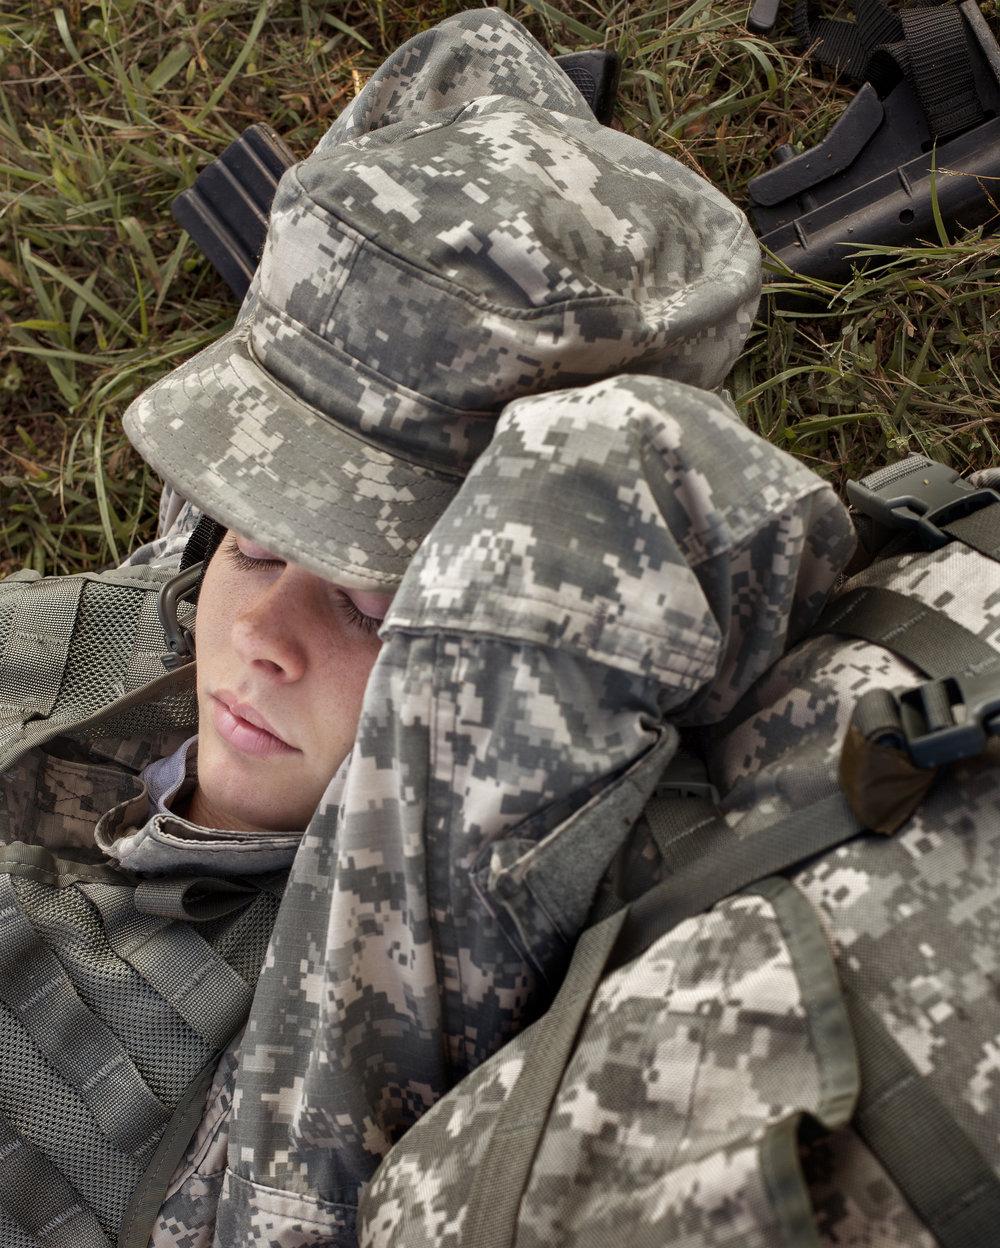 Powers Sleeping, Fort Dix, New Jersey, 2012